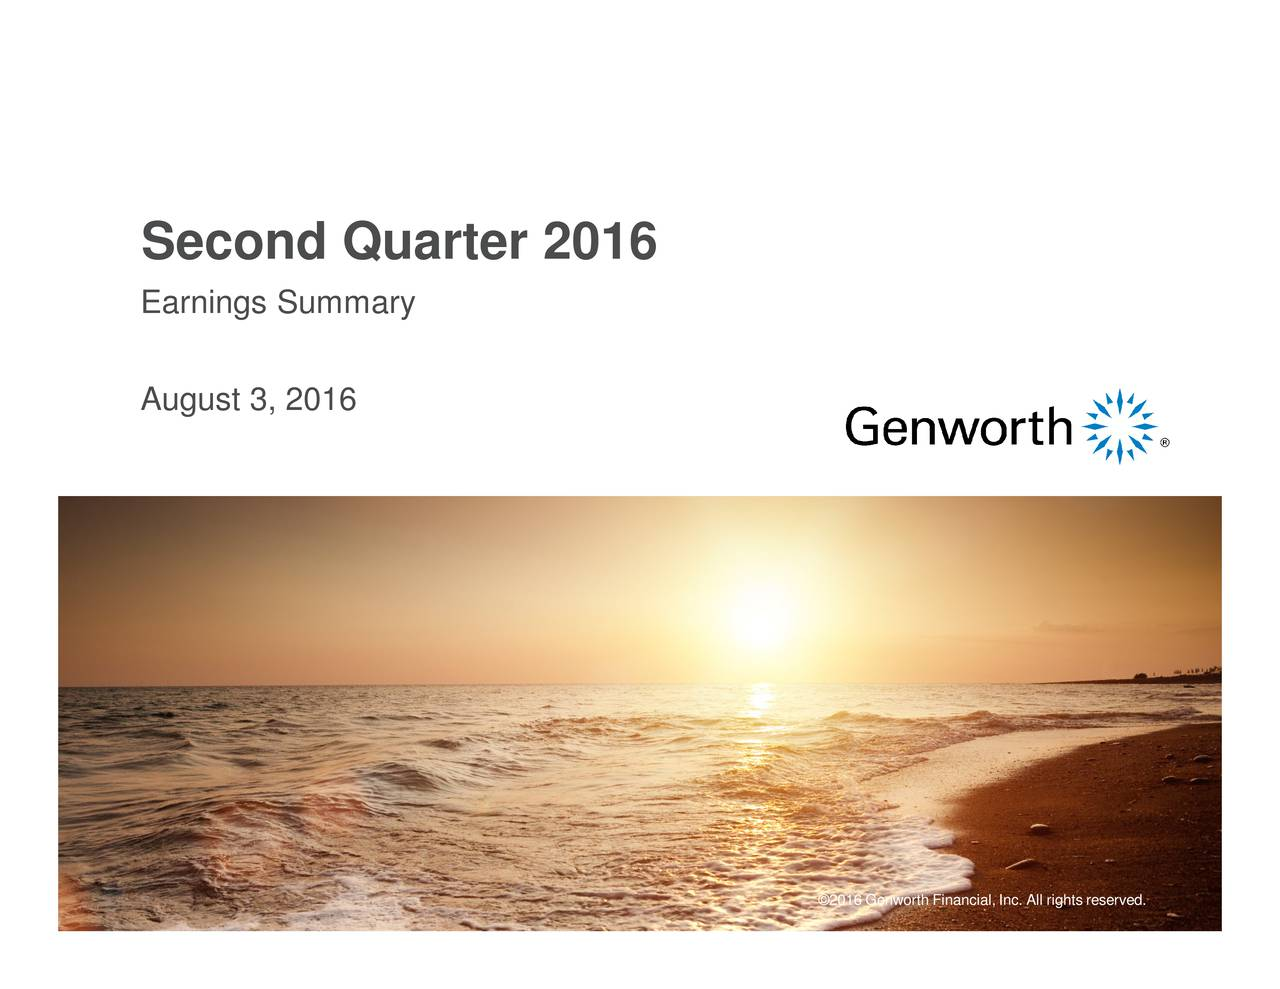 Second Quarter 2016 EarninAugSumt3,r016